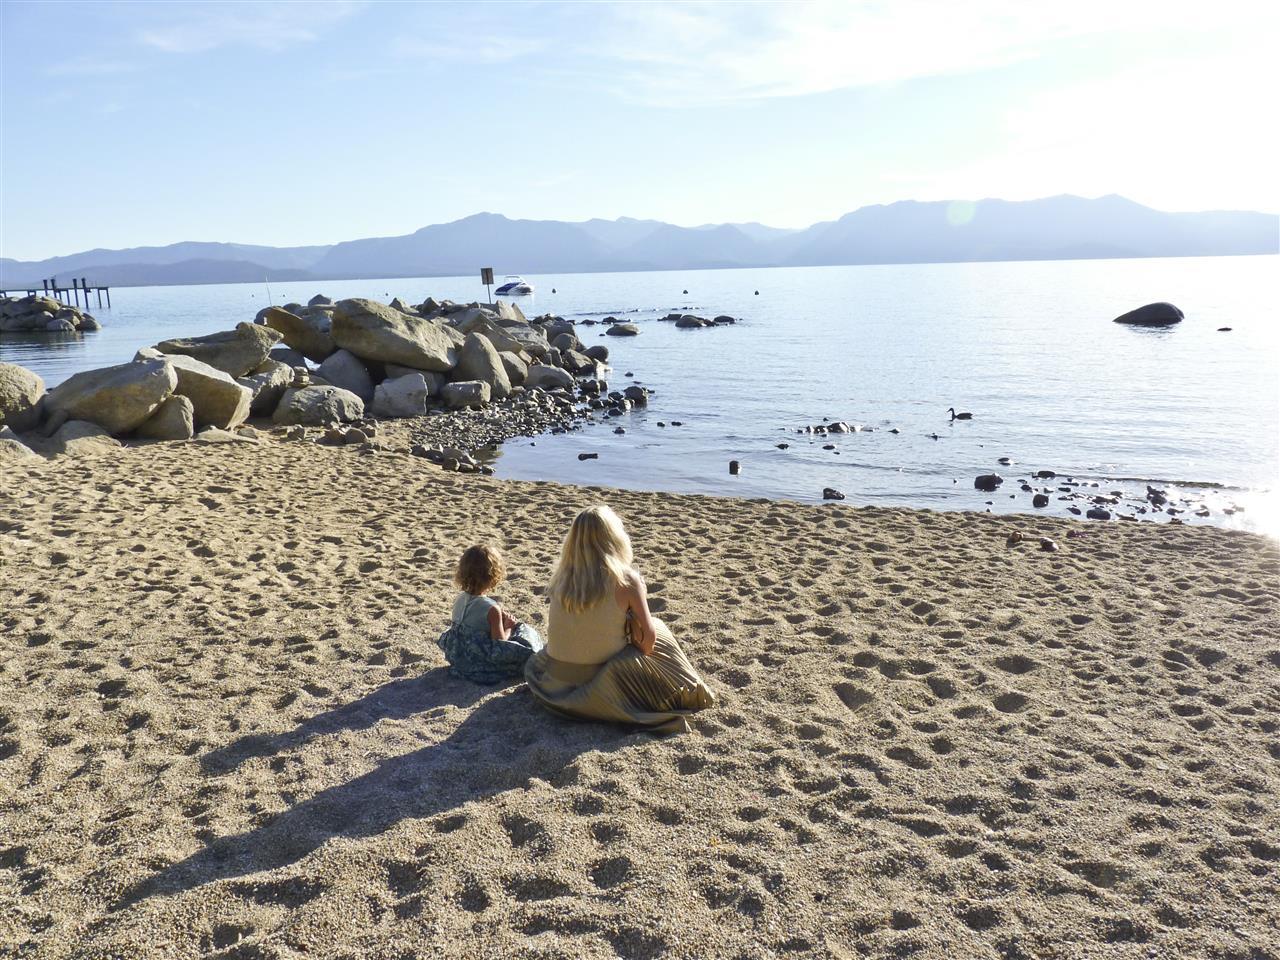 Skyland Beach Zephyr Cove, Nevada Lake Tahoe